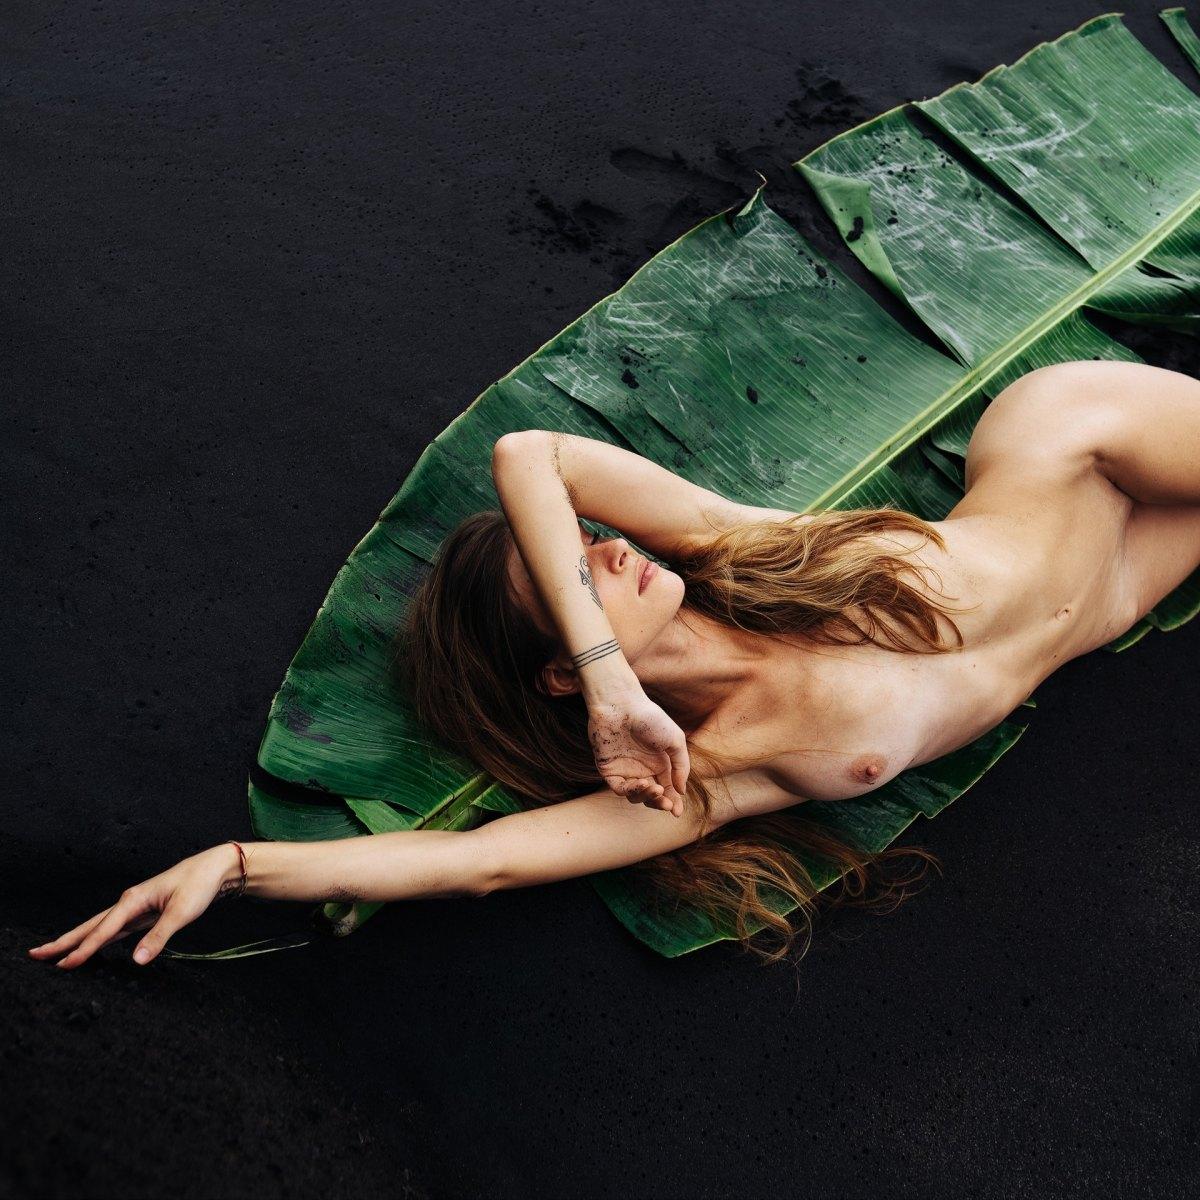 Yasya by Roman Gutikov